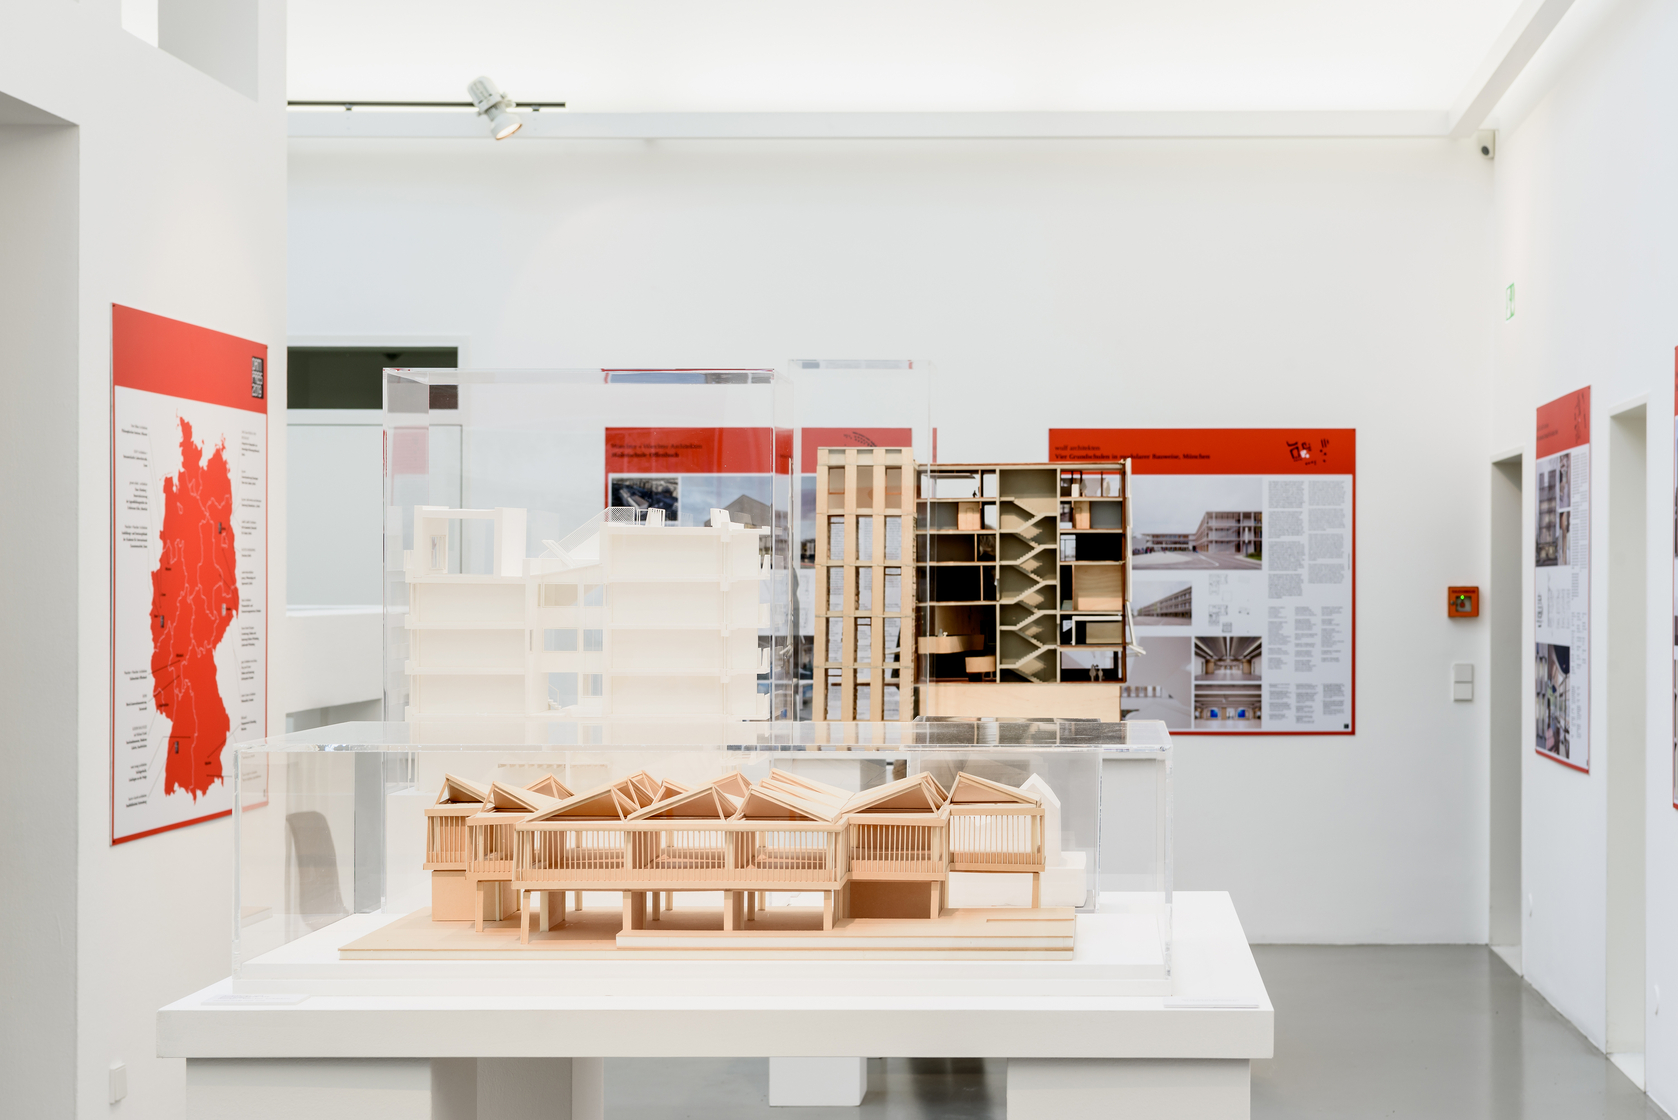 DAM Preis 2019 Finalist_AIZ Bonn_Modell